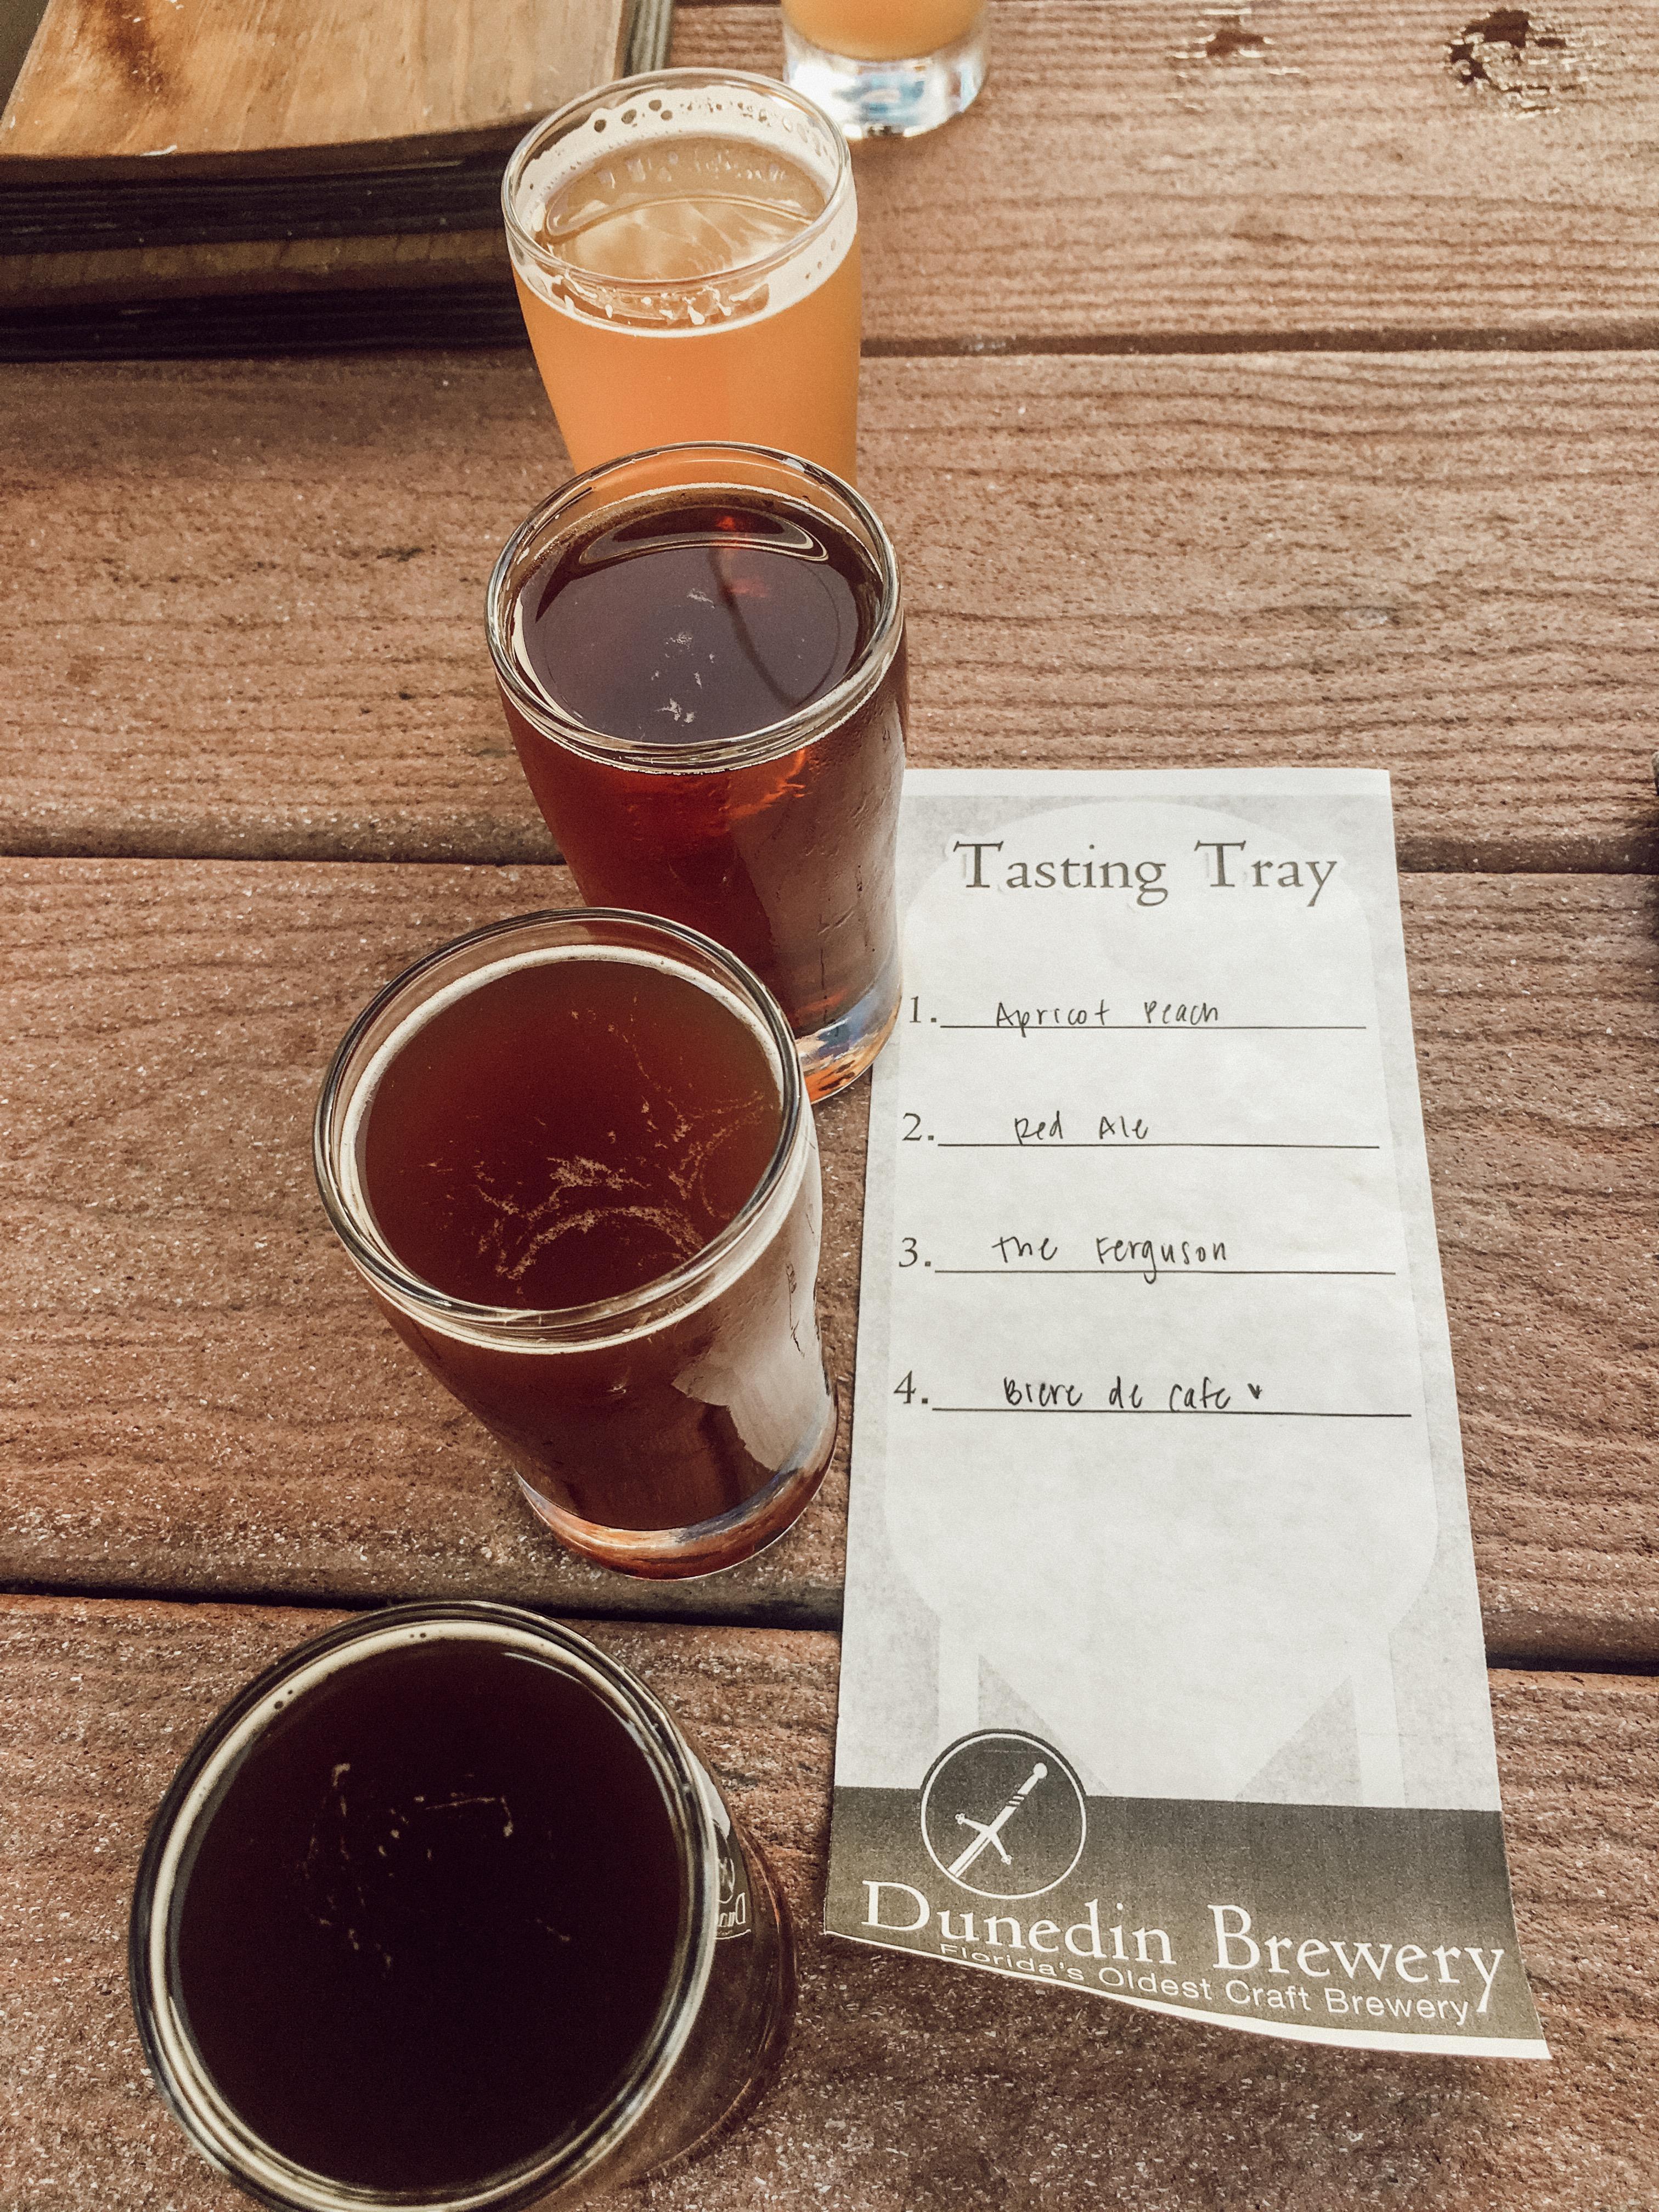 Dunedin Brewery in Dunedin, Florida